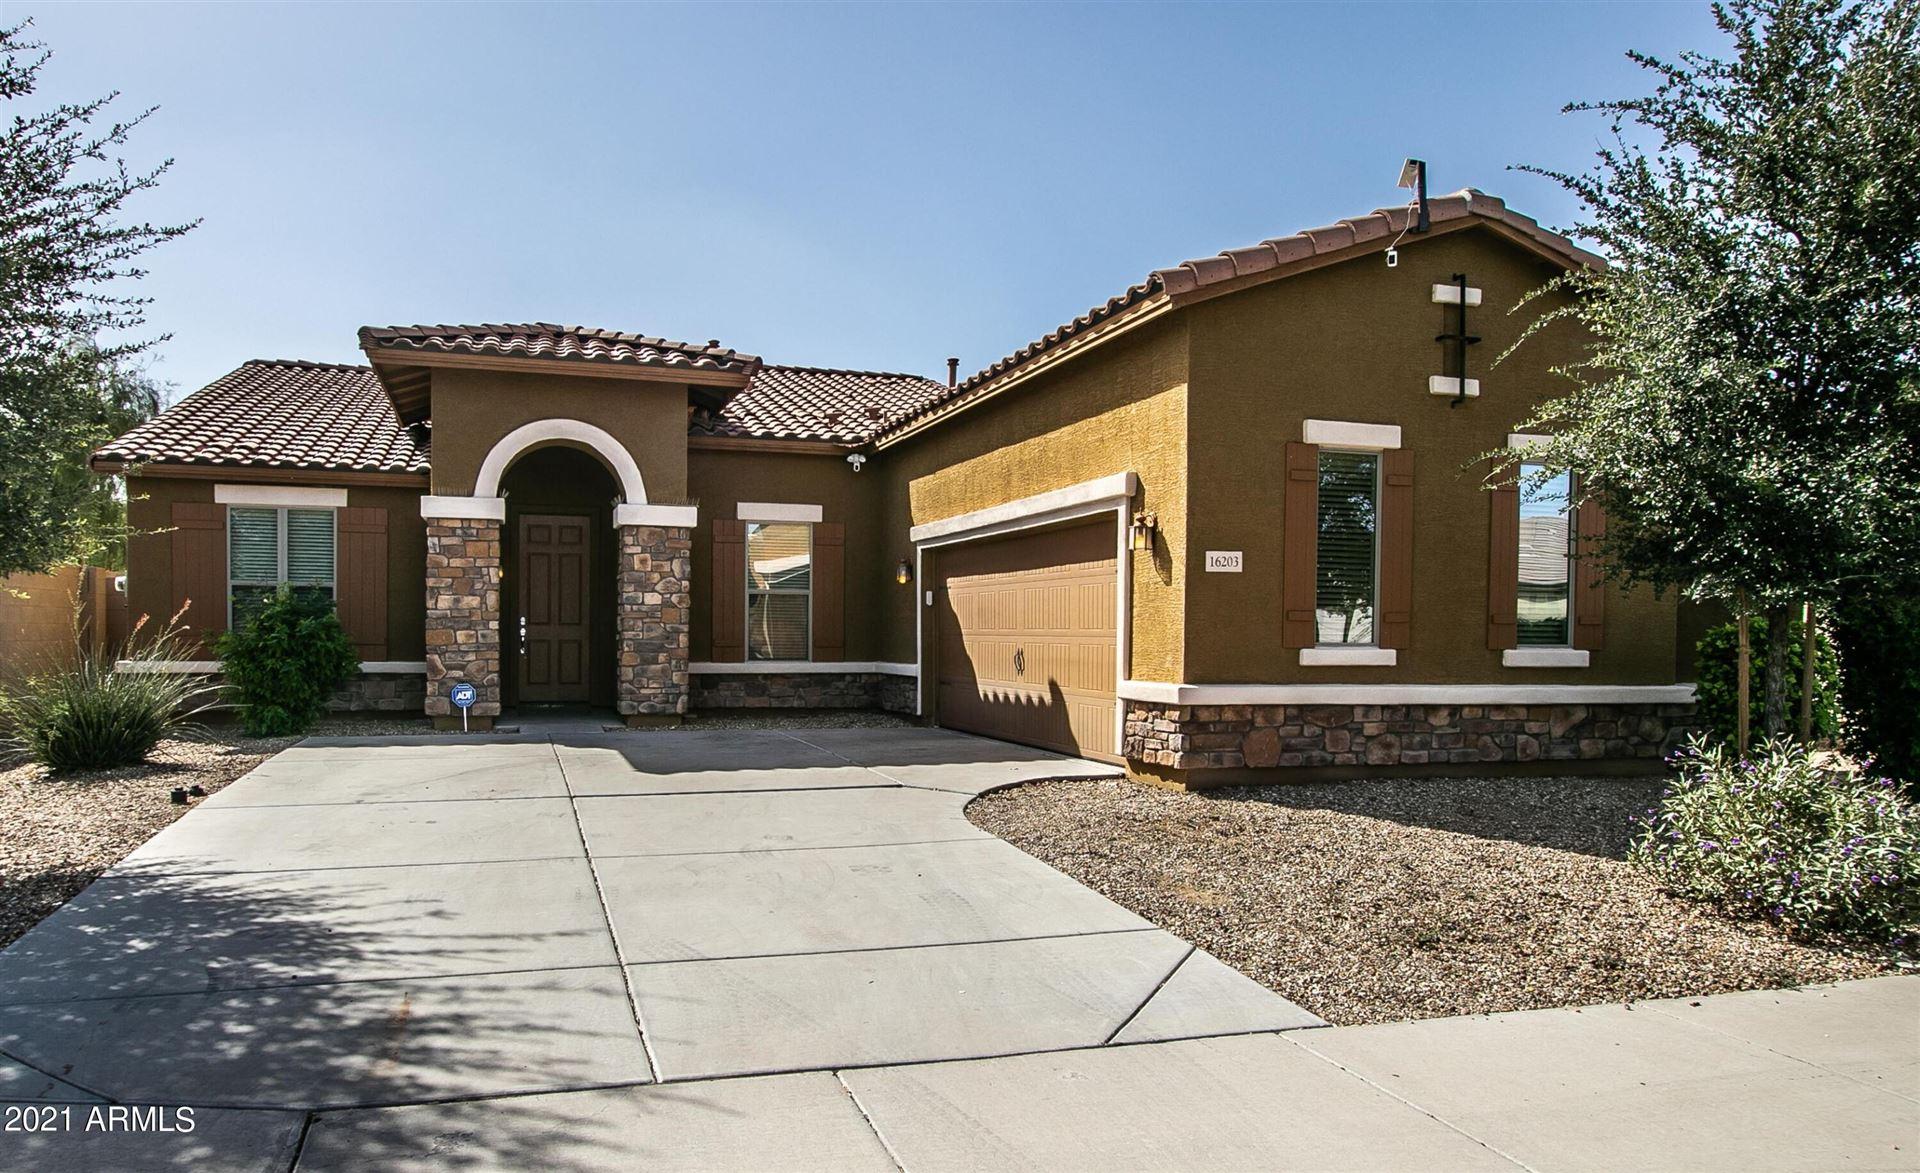 Photo of 16203 W PAPAGO Street, Goodyear, AZ 85338 (MLS # 6306361)